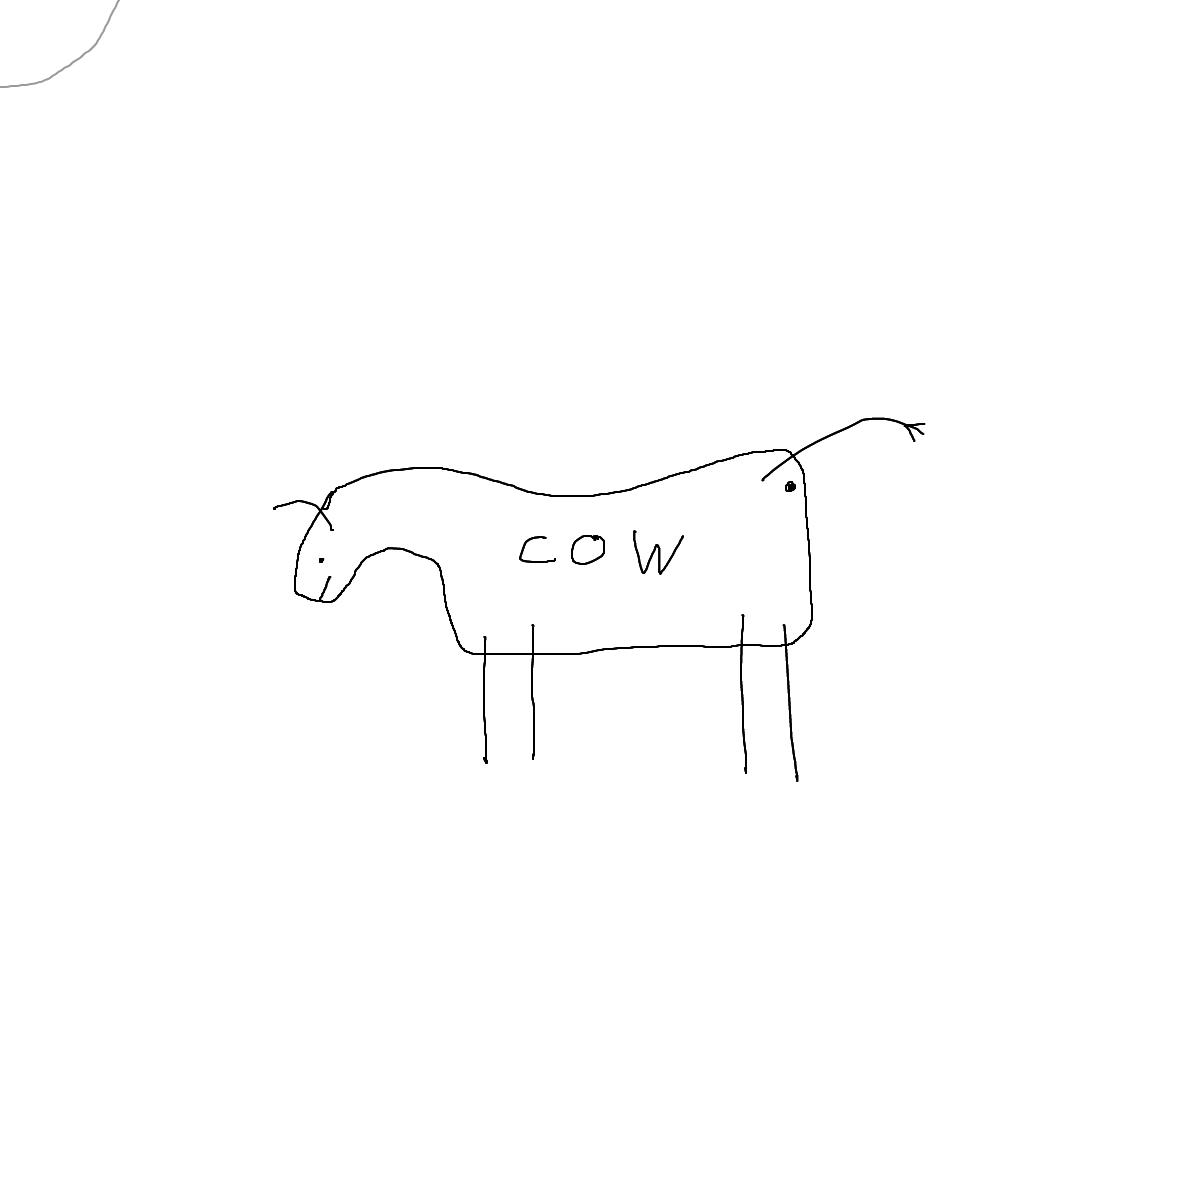 BAAAM drawing#2138 lat:52.4750175476074200lng: 13.4068174362182620